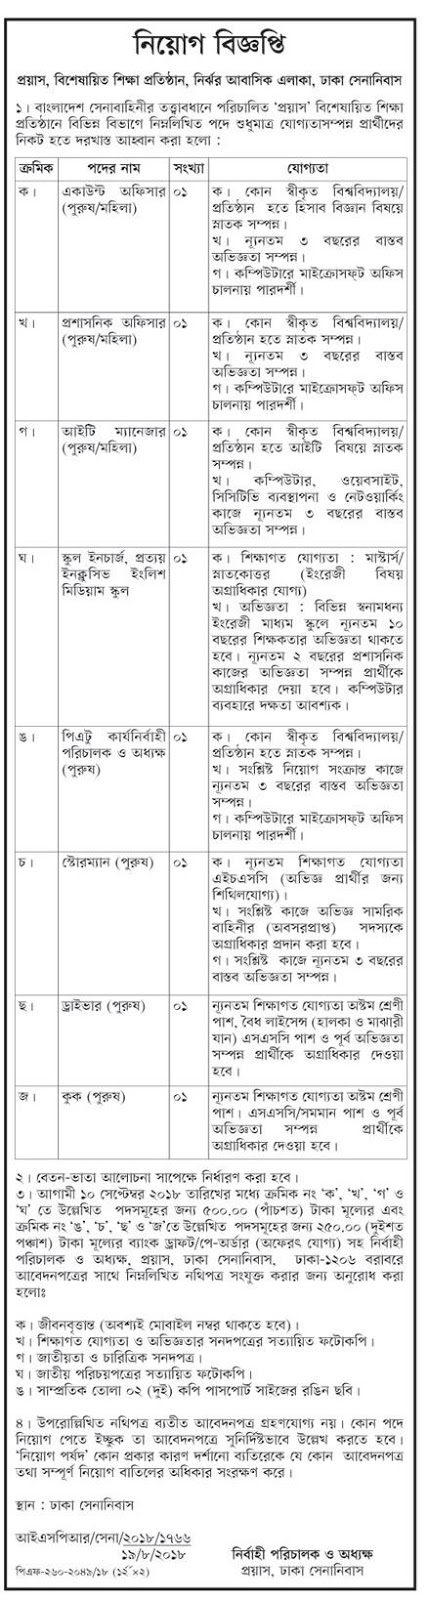 Bangladesh Army under Proyas Job Circular 2018